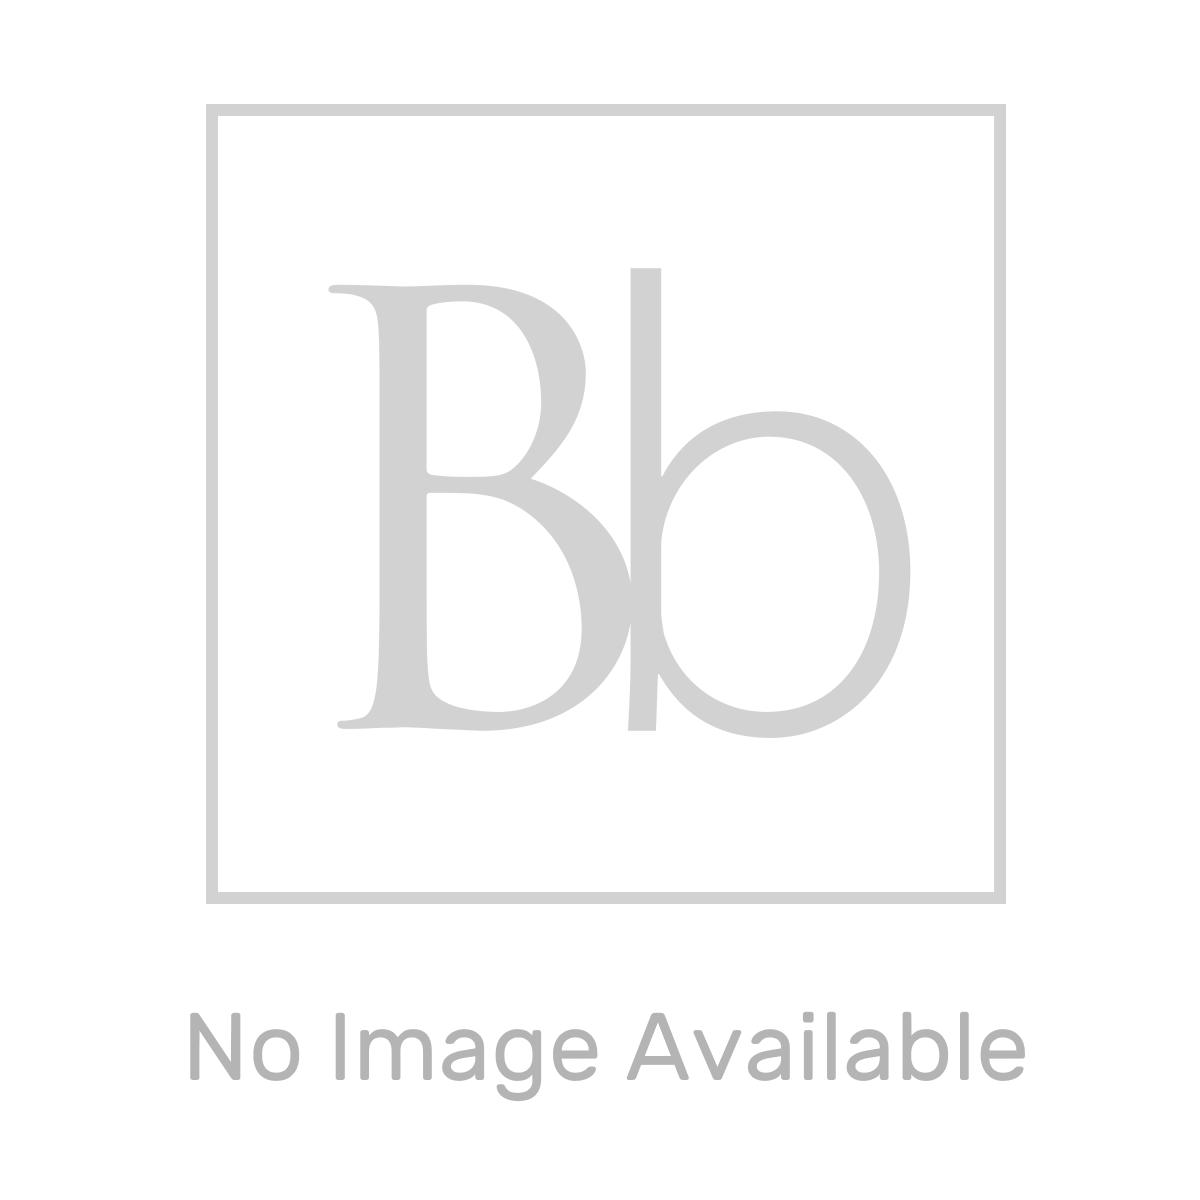 Premier Kensington Freestanding Slipper Bath with Leg Set